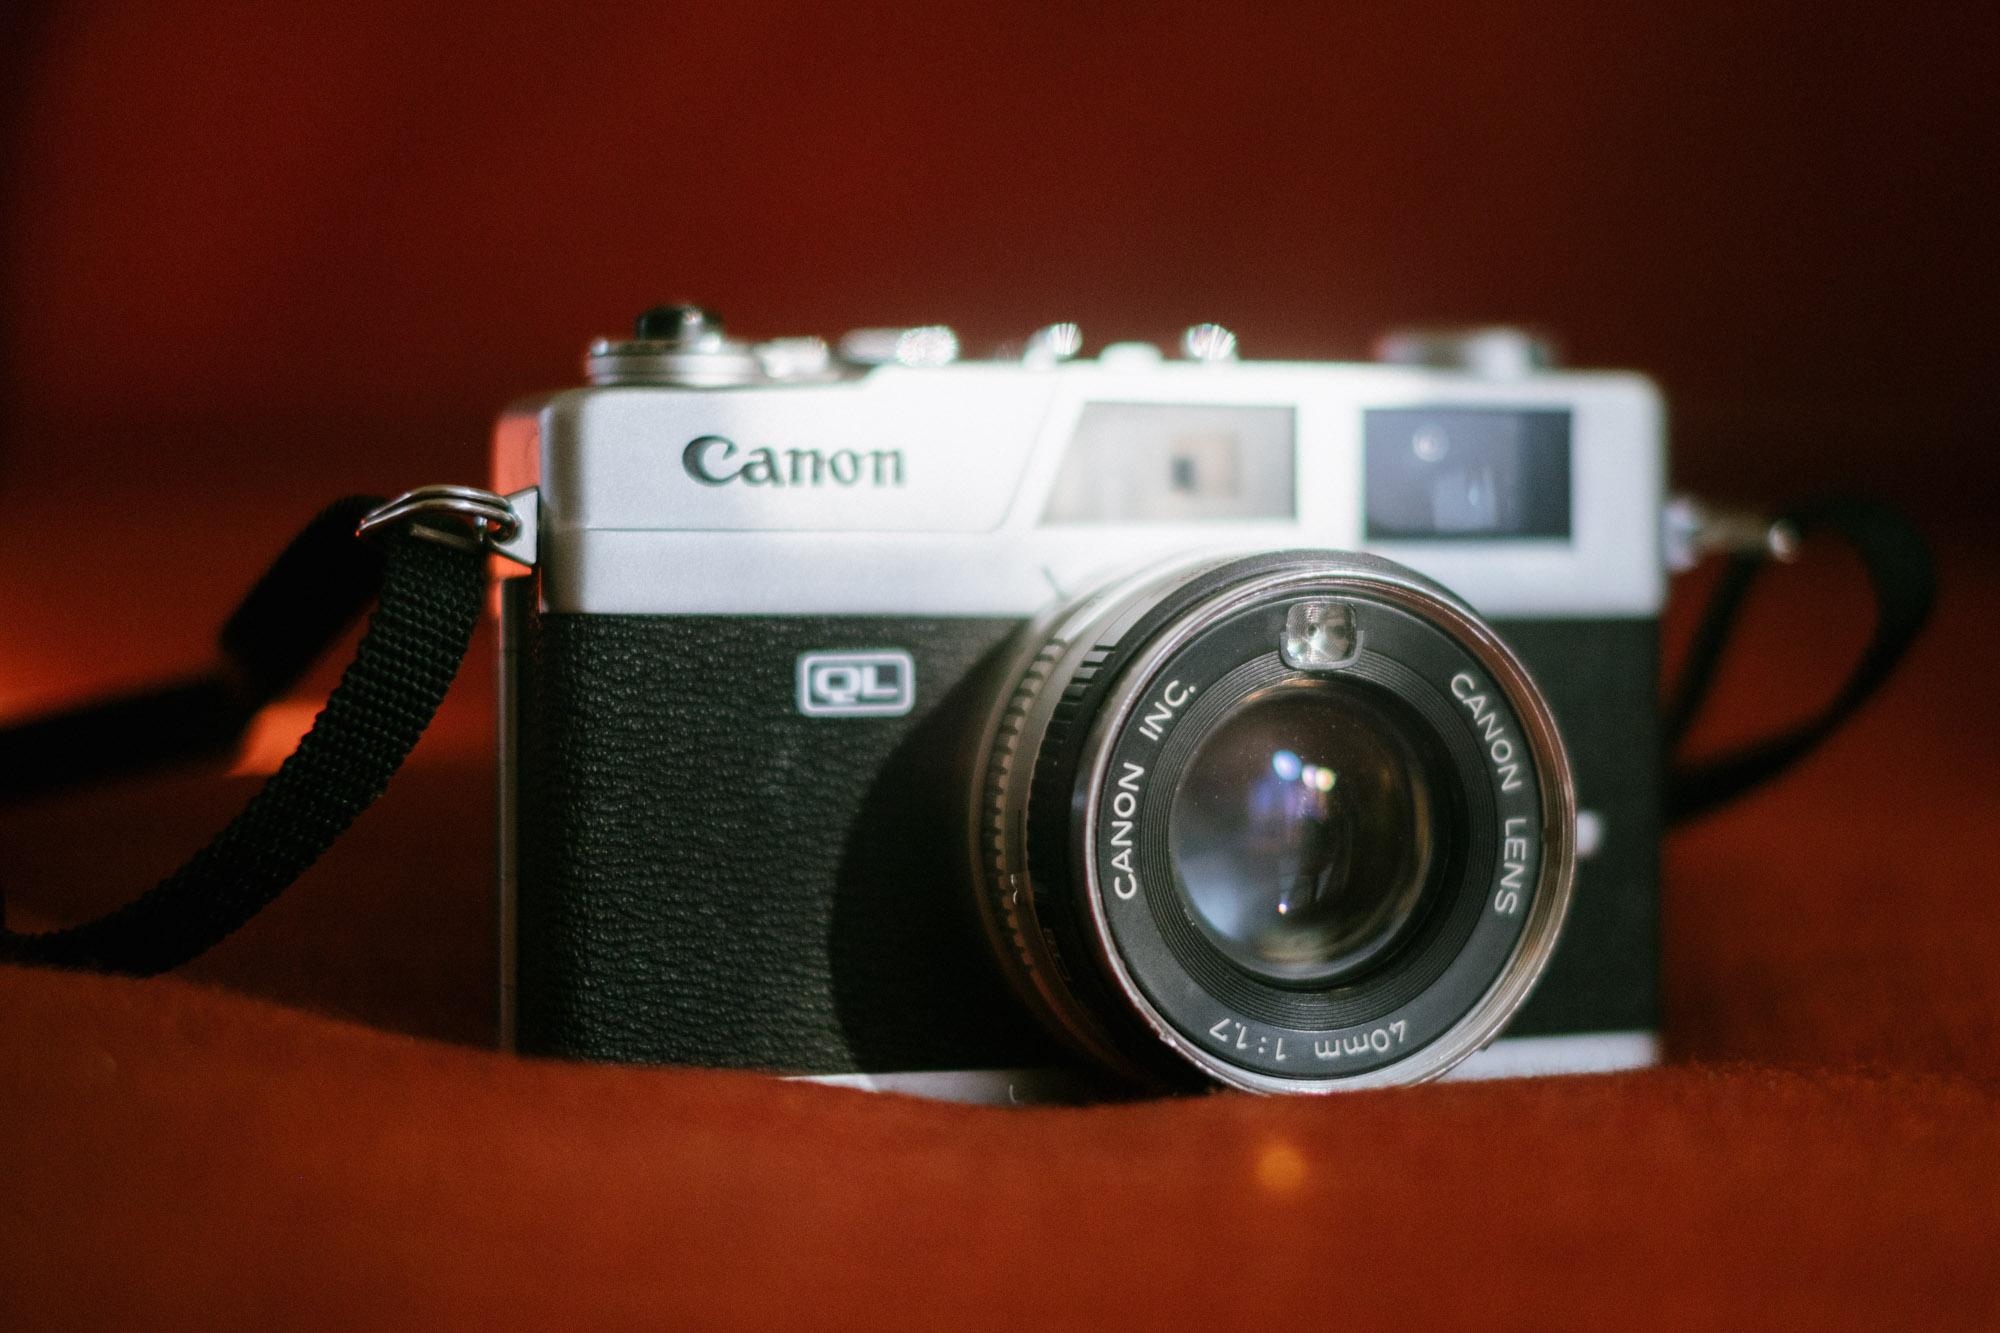 The Canonet QL 17. Fuji X-Pro1, Fujinon 35mm f/1.4.